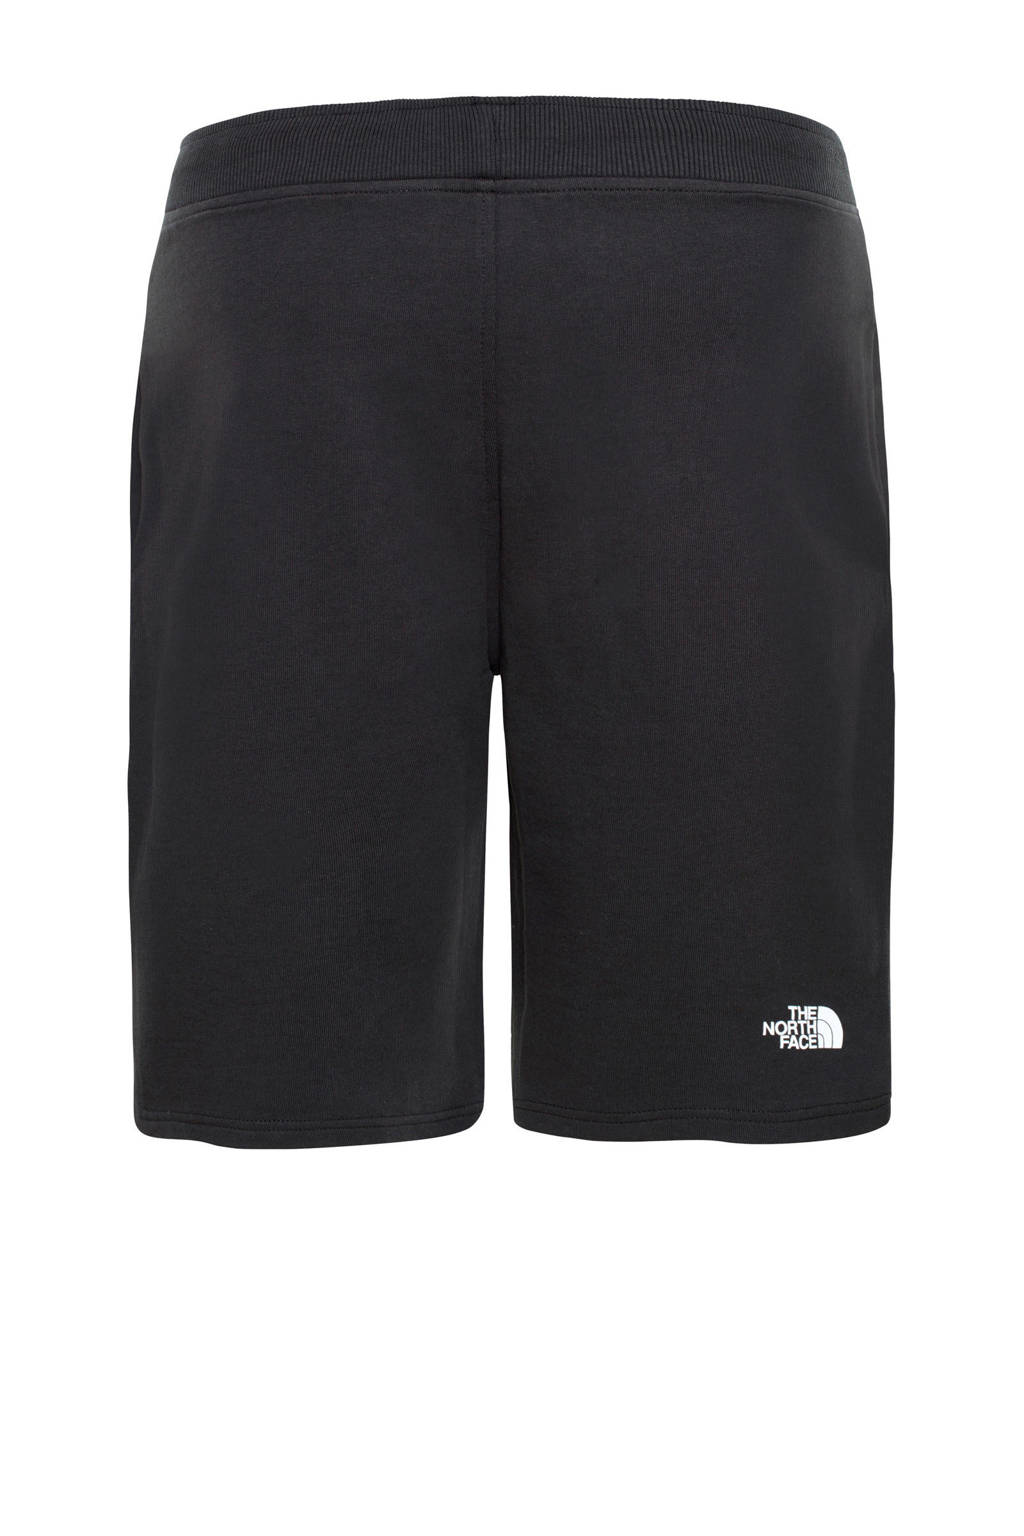 The North Face   joggingshort zwart, Zwart